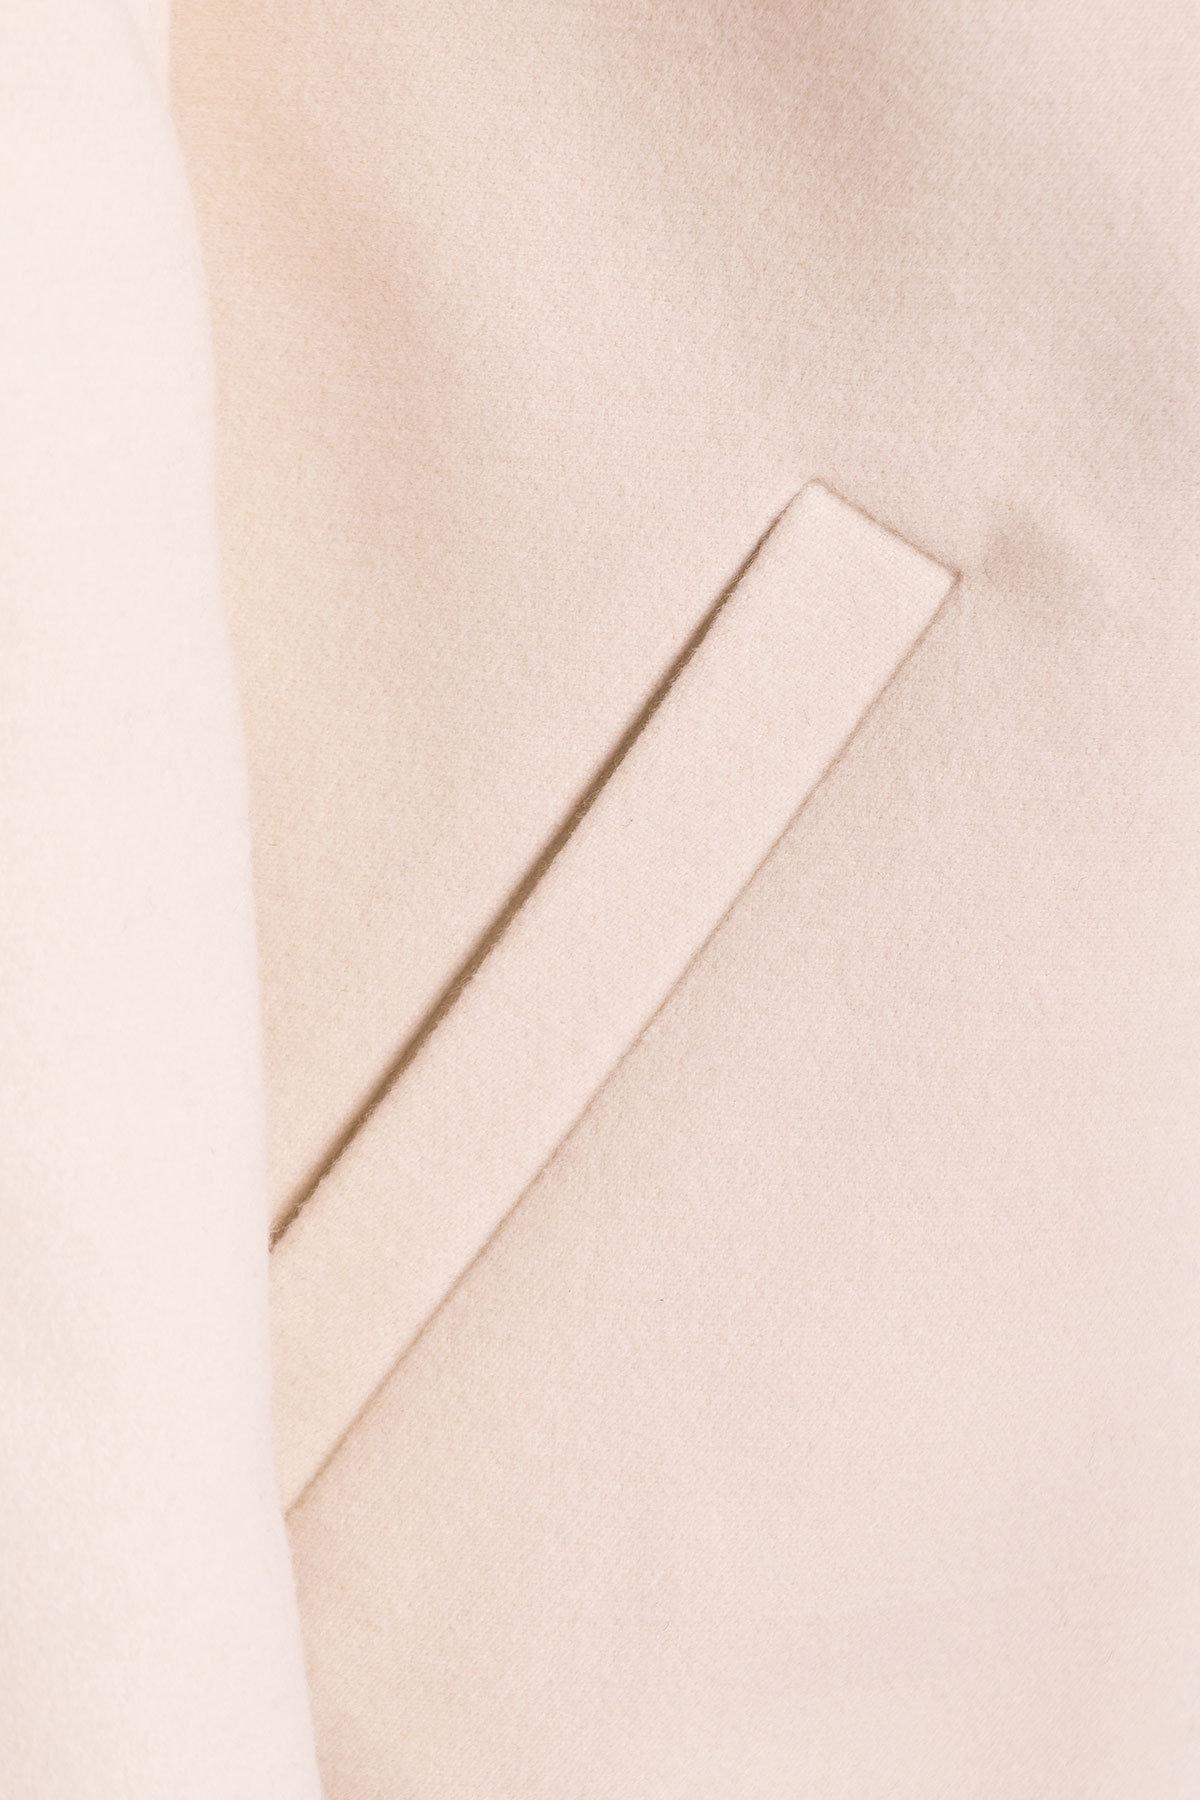 Пальто Фортуна 4812 Цвет: Светло-бежевый